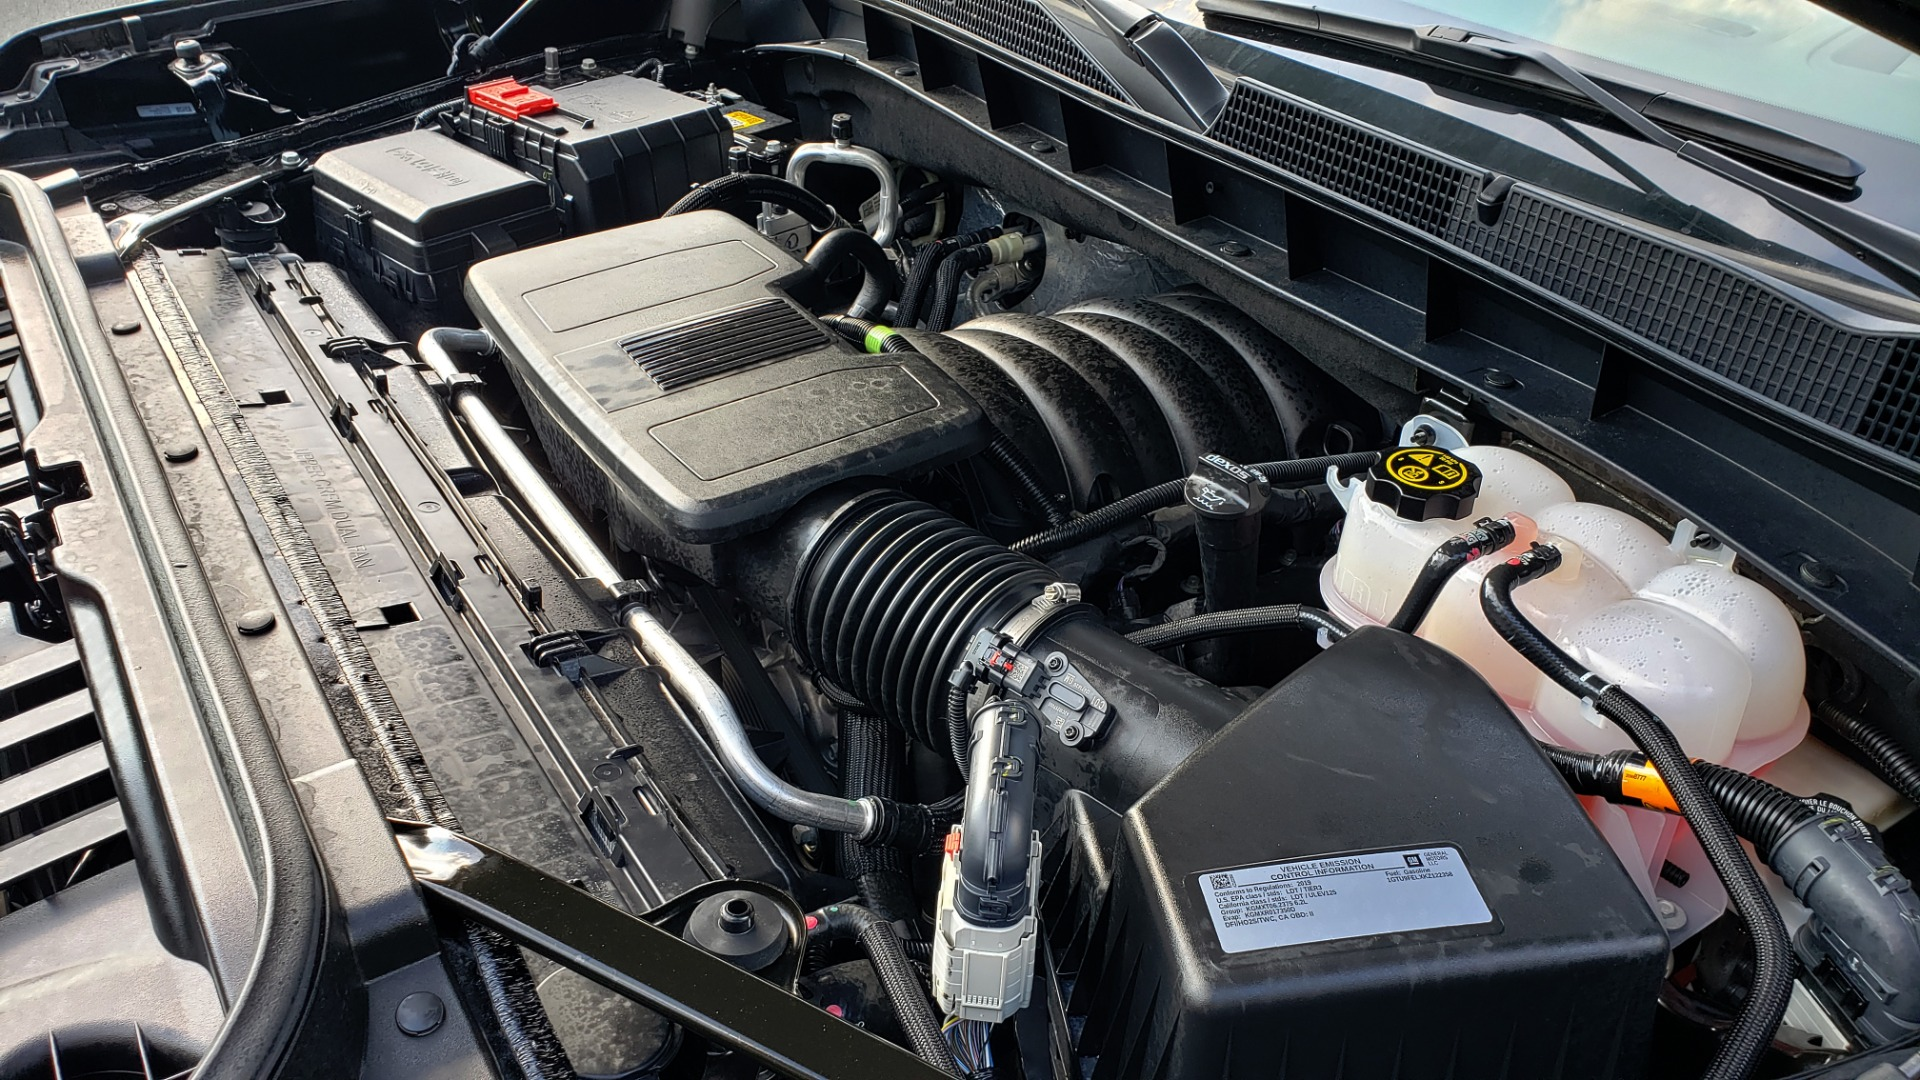 Used 2019 GMC SIERRA 1500 DENALI ULTIMATE 4WD / NAV / TECH PKG / DRVR ALRT for sale Sold at Formula Imports in Charlotte NC 28227 17